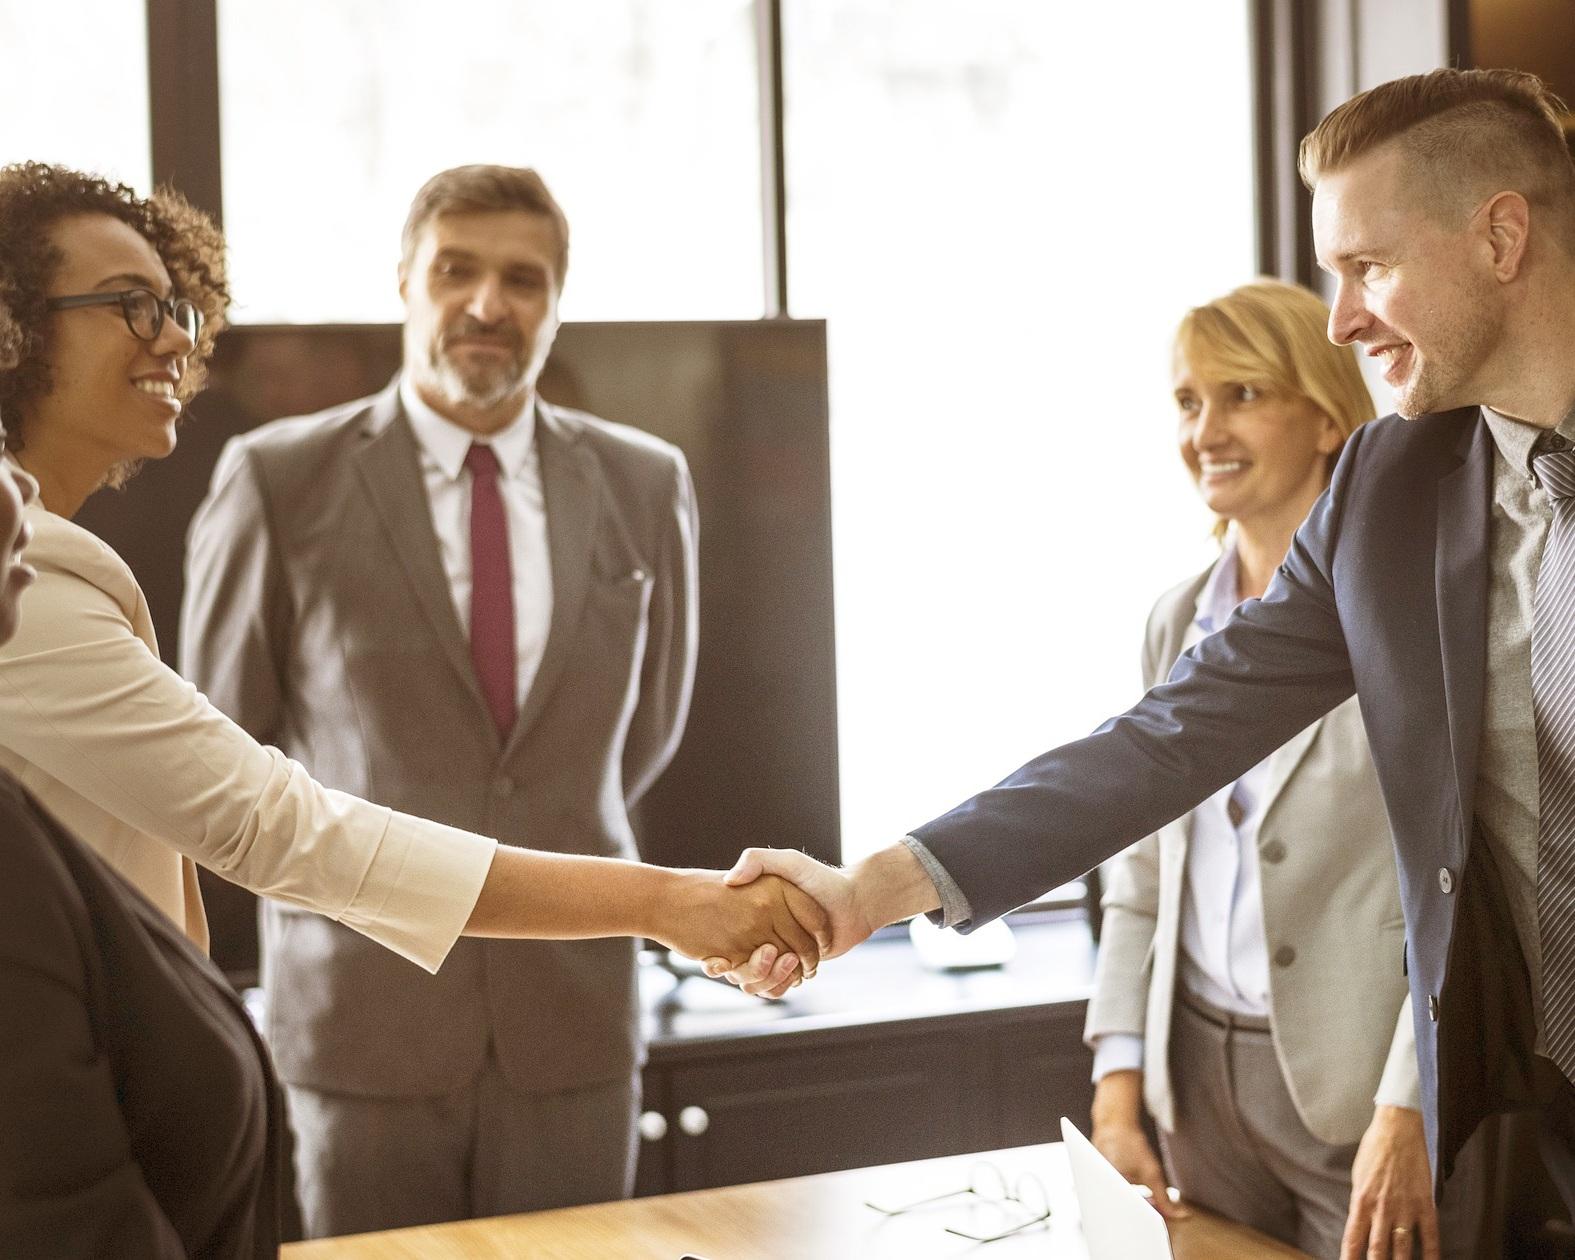 Chijmes-CorporateEvents-Agreement-1.jpg